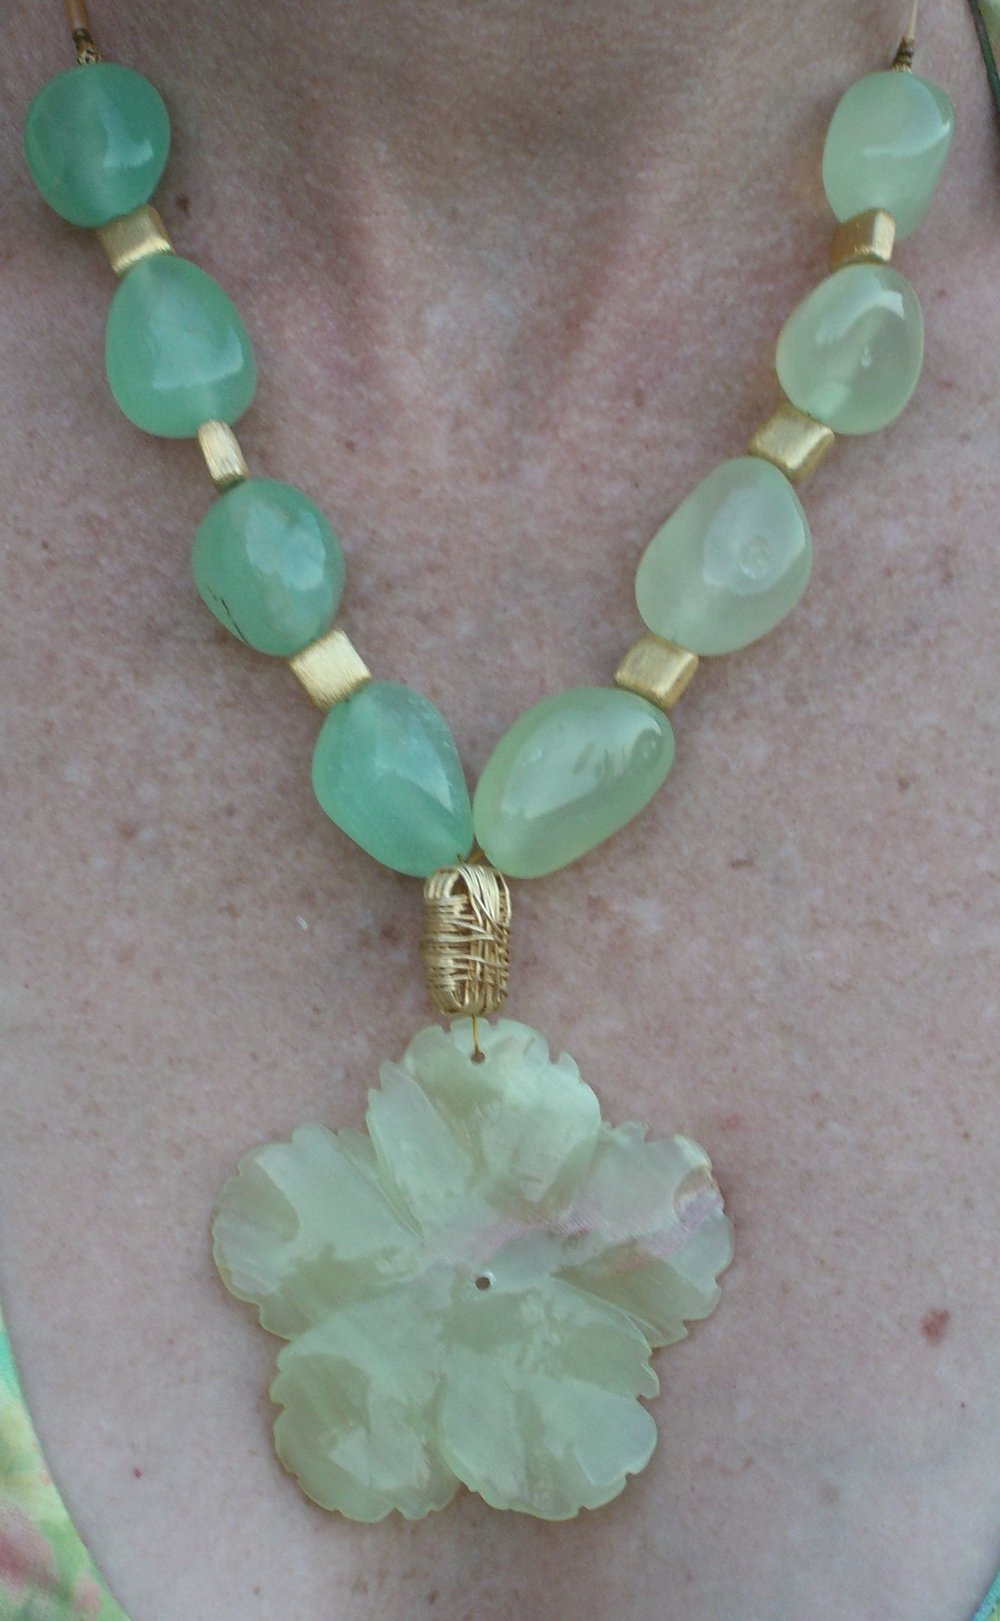 # 177 Jade Heart - Sold